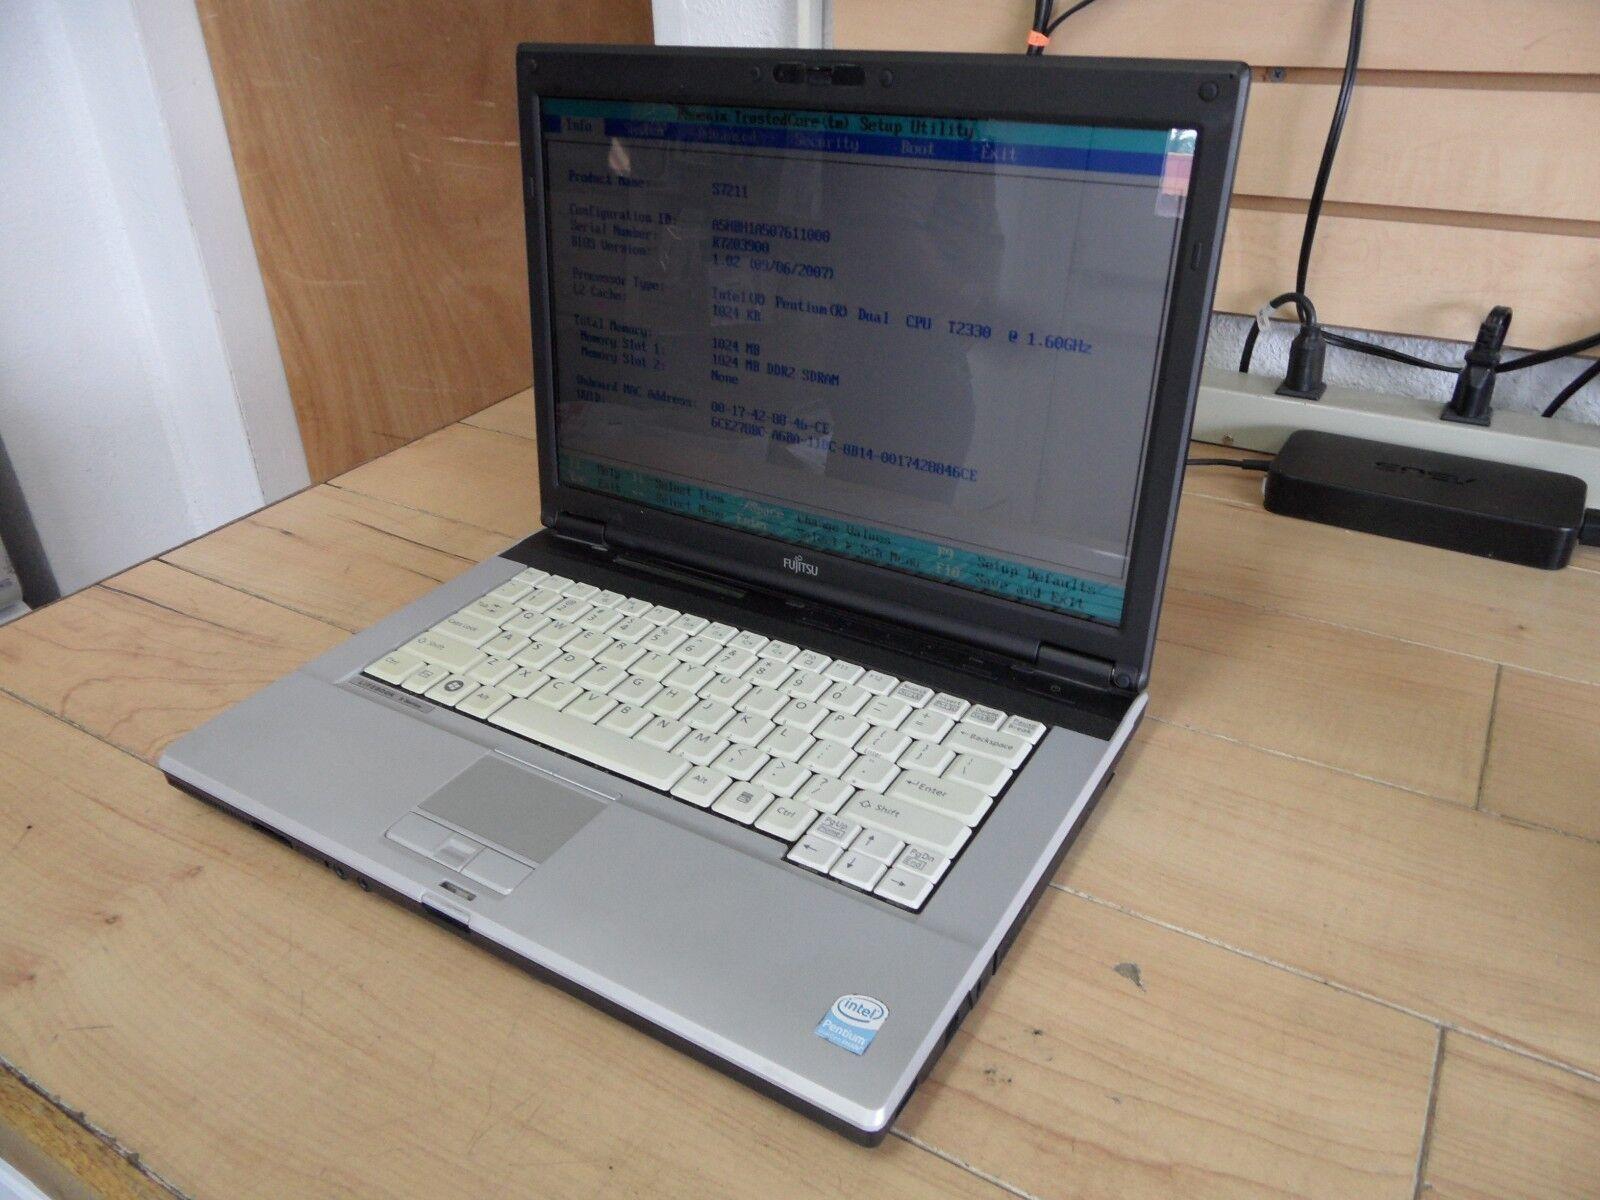 Fujitsu Lifebook S Series S7211 Laptop For Parts Posted Bios No Hard Drive *